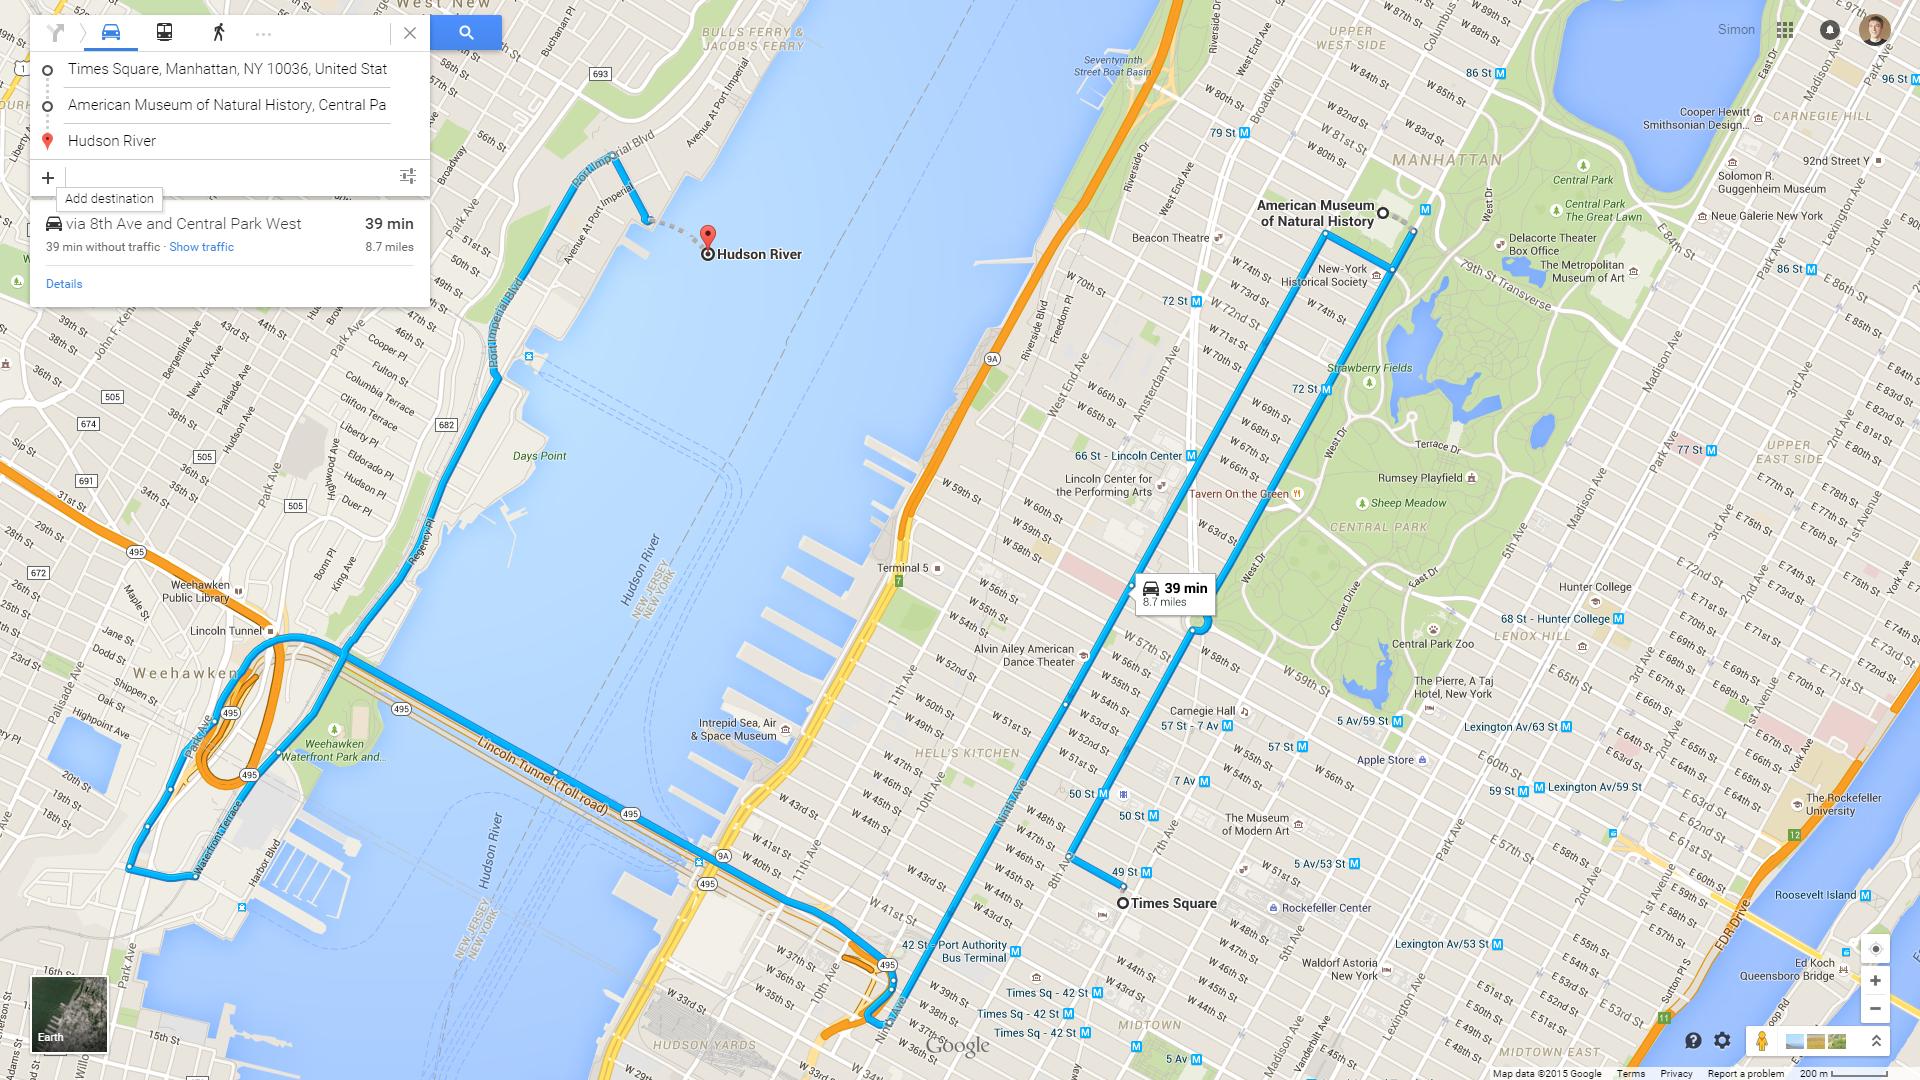 Google Shuts Down Map Maker - Brings Features to Maps | Map ... on google traffic, google elevation data, library of congress digital maps, google statistics, google digital wallet,